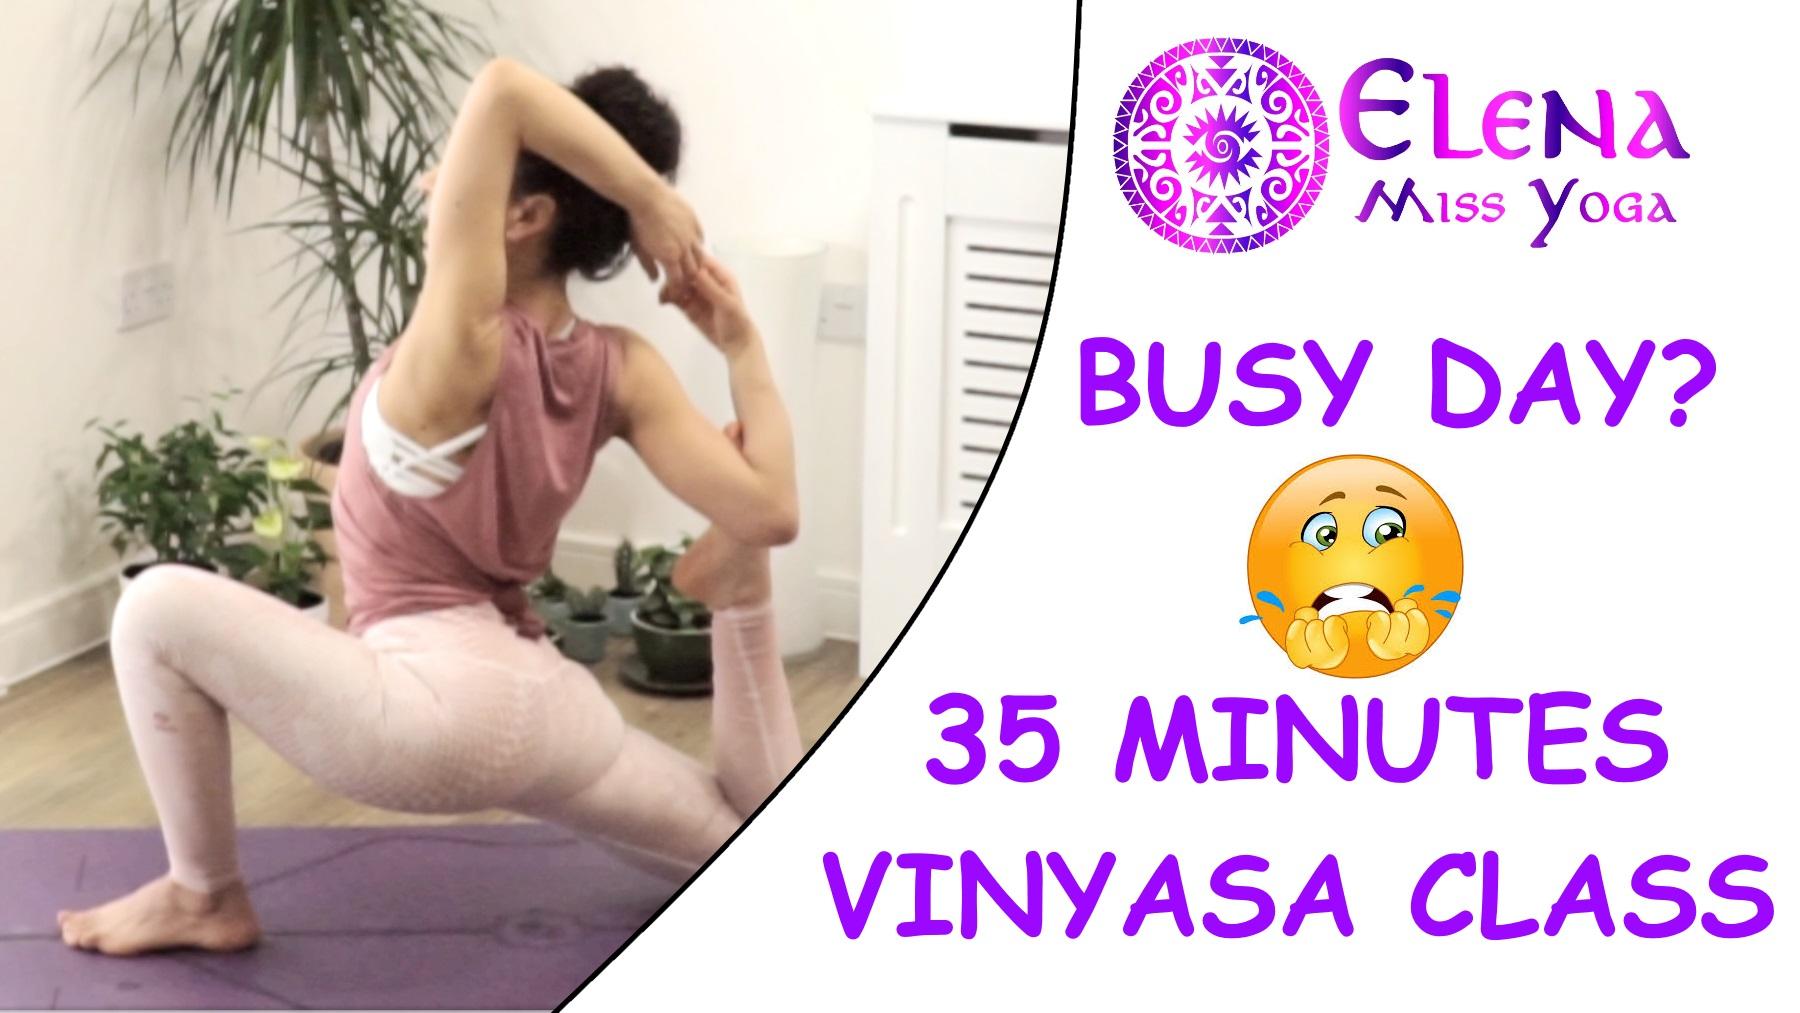 BUSY DAY? 35 MINUTES VINYASA YOGA CLASS